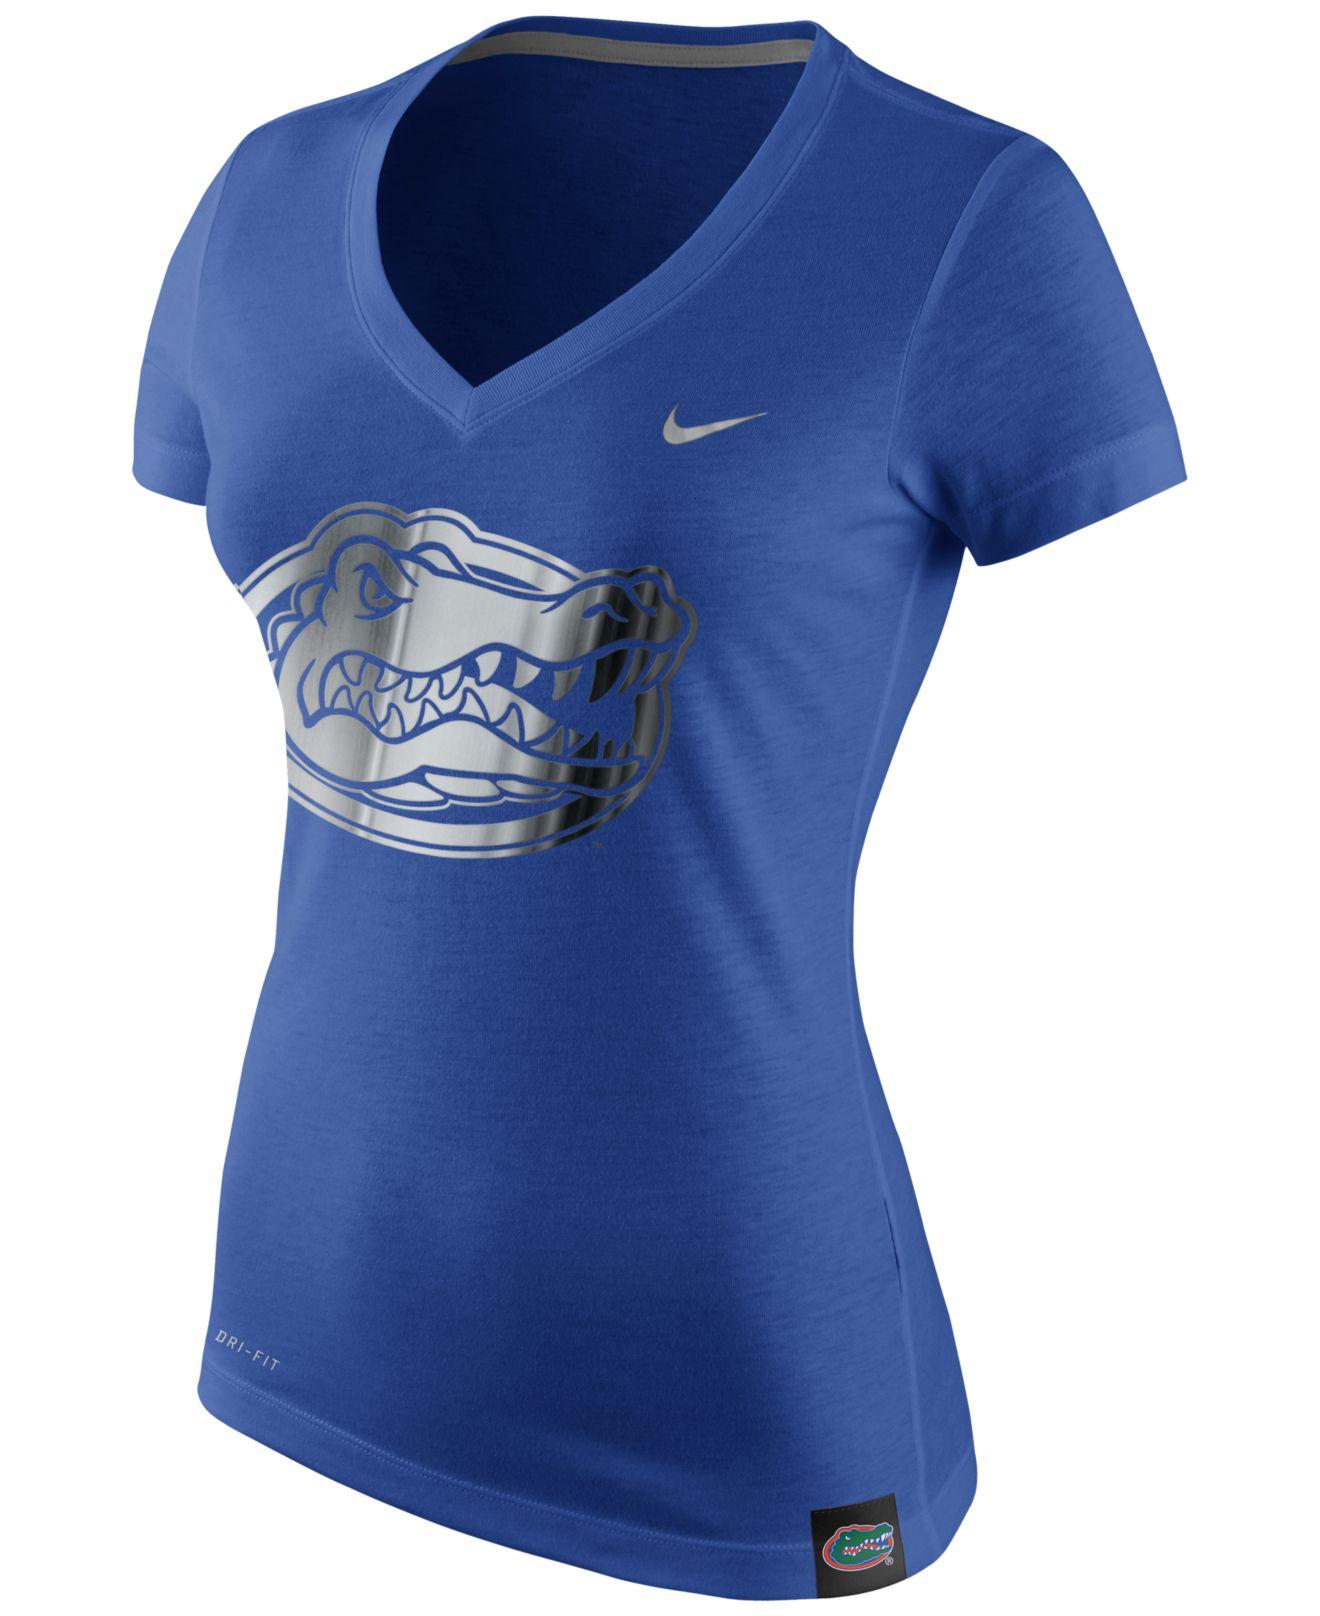 Nike women 39 s short sleeve florida gators dri fit t shirt for Nike dri fit t shirt ladies